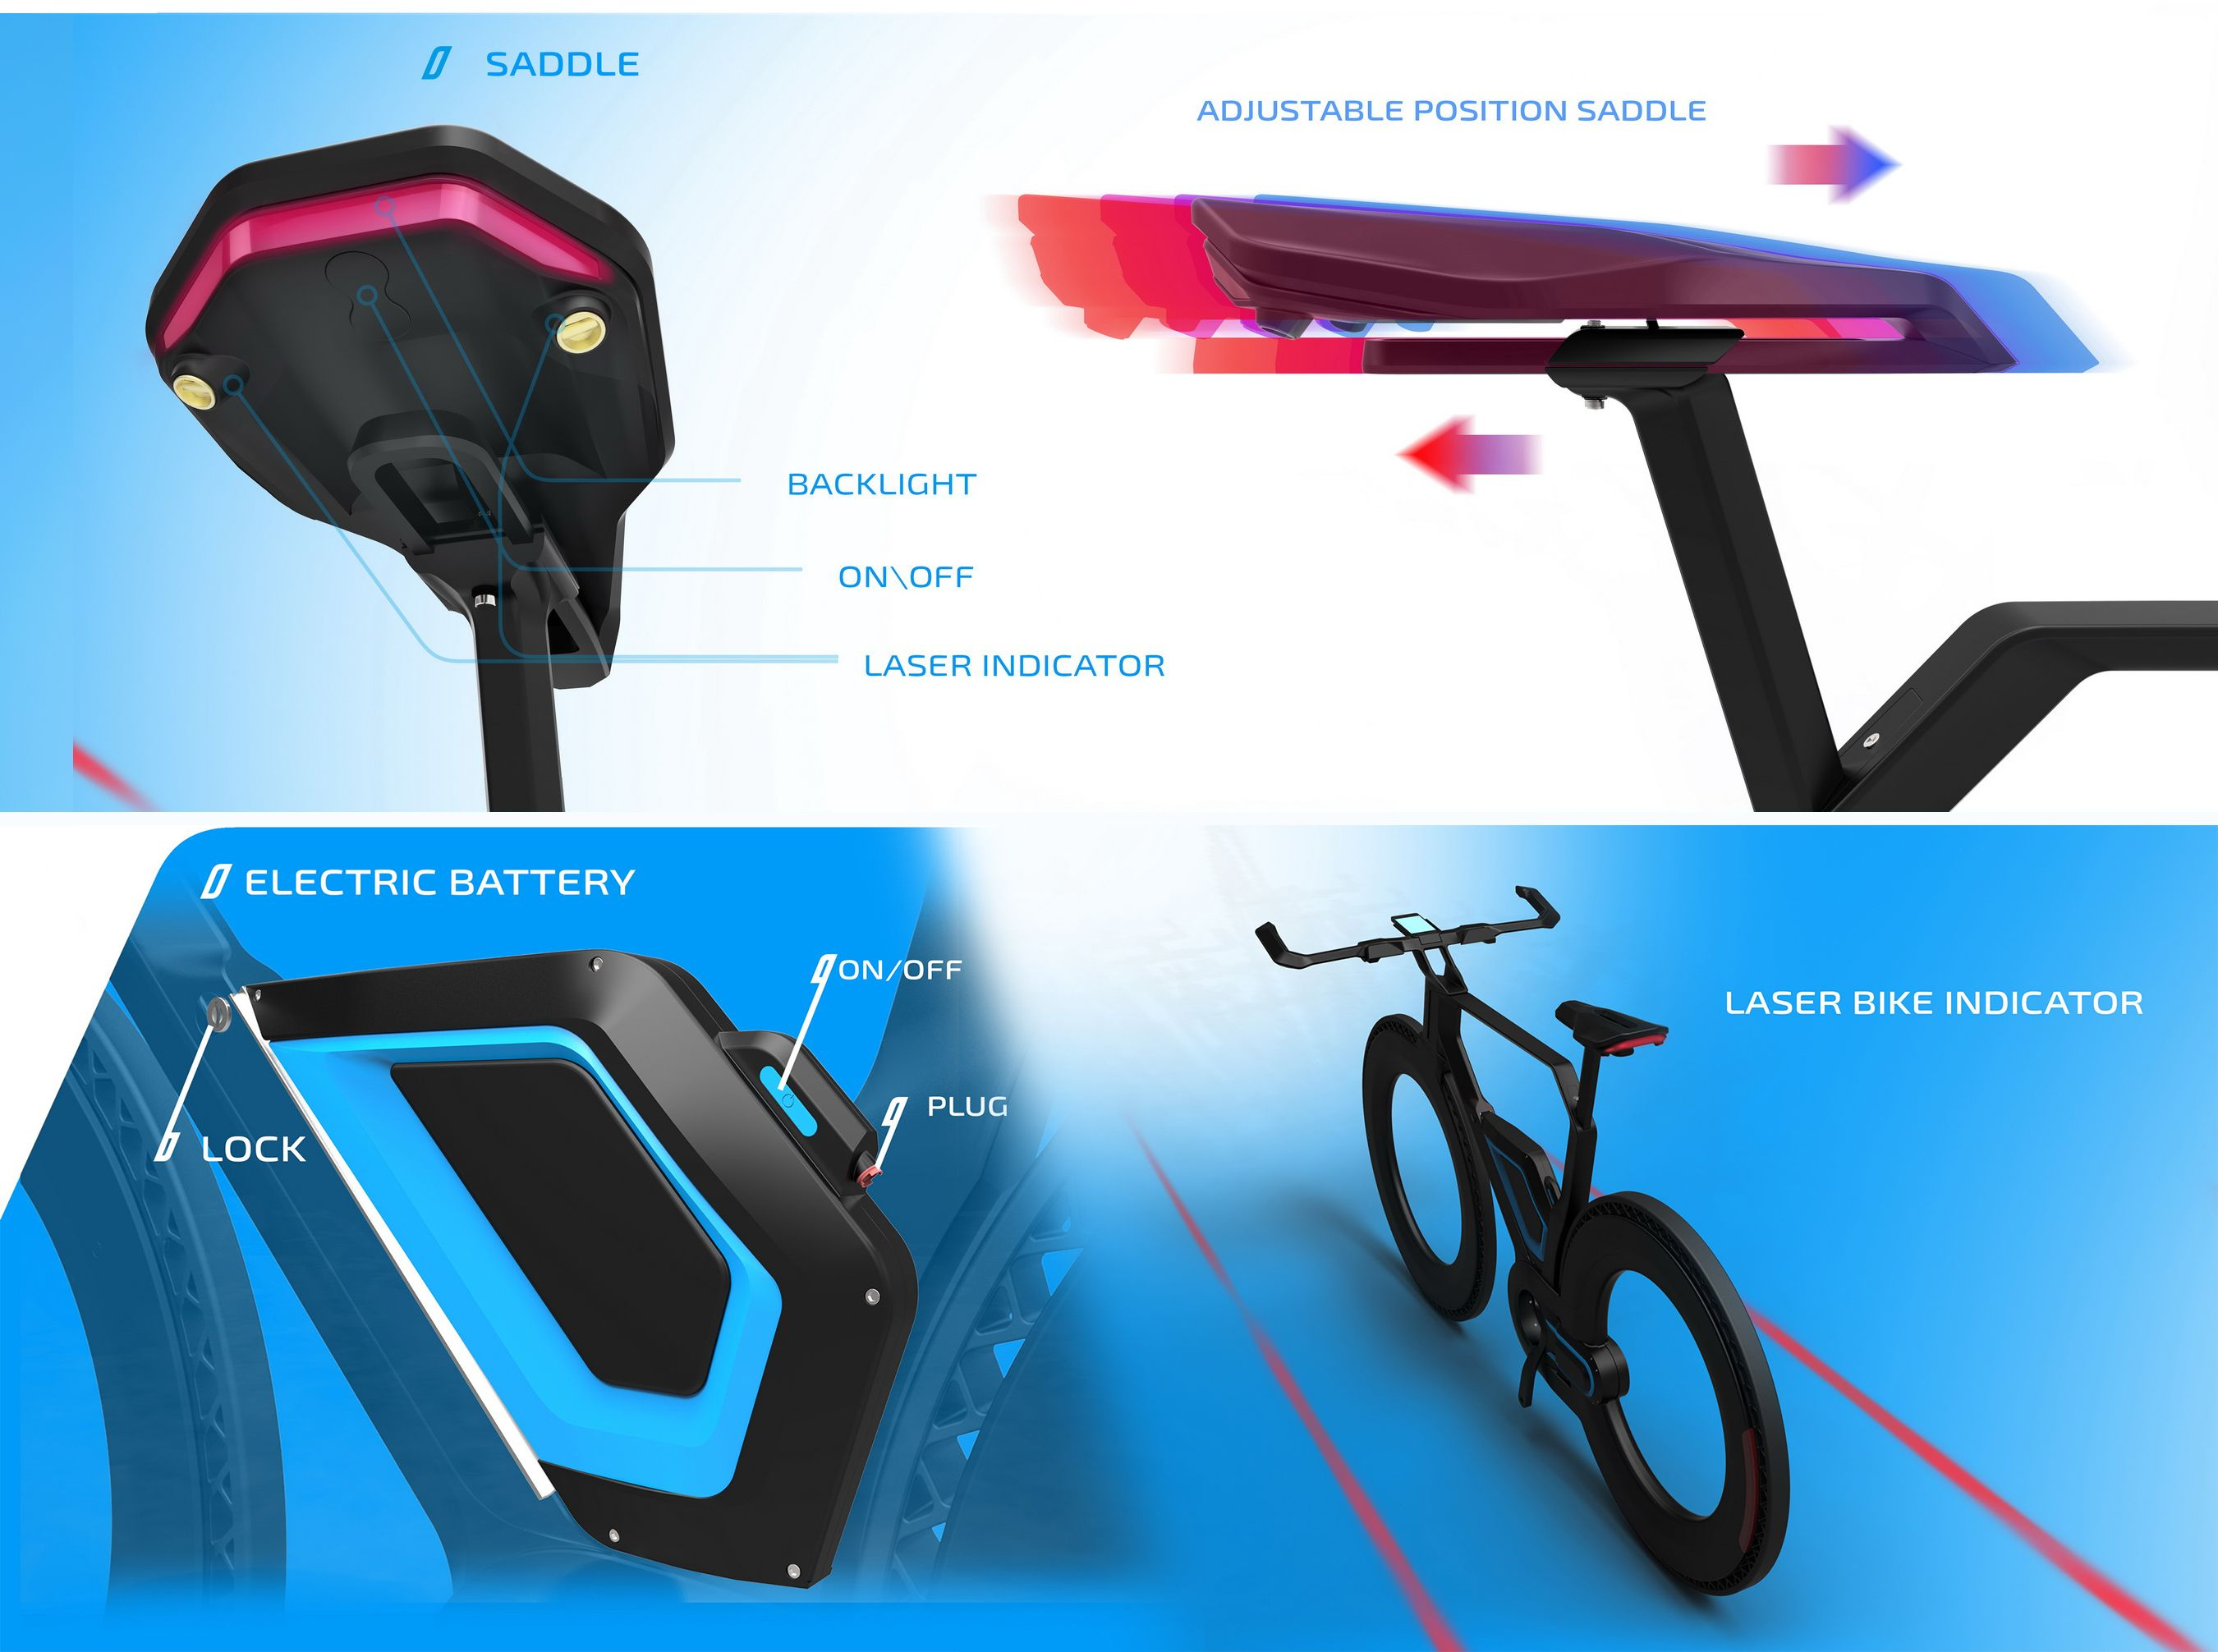 E-bike 2025 concept. Saddle and battery bicycle bike concept